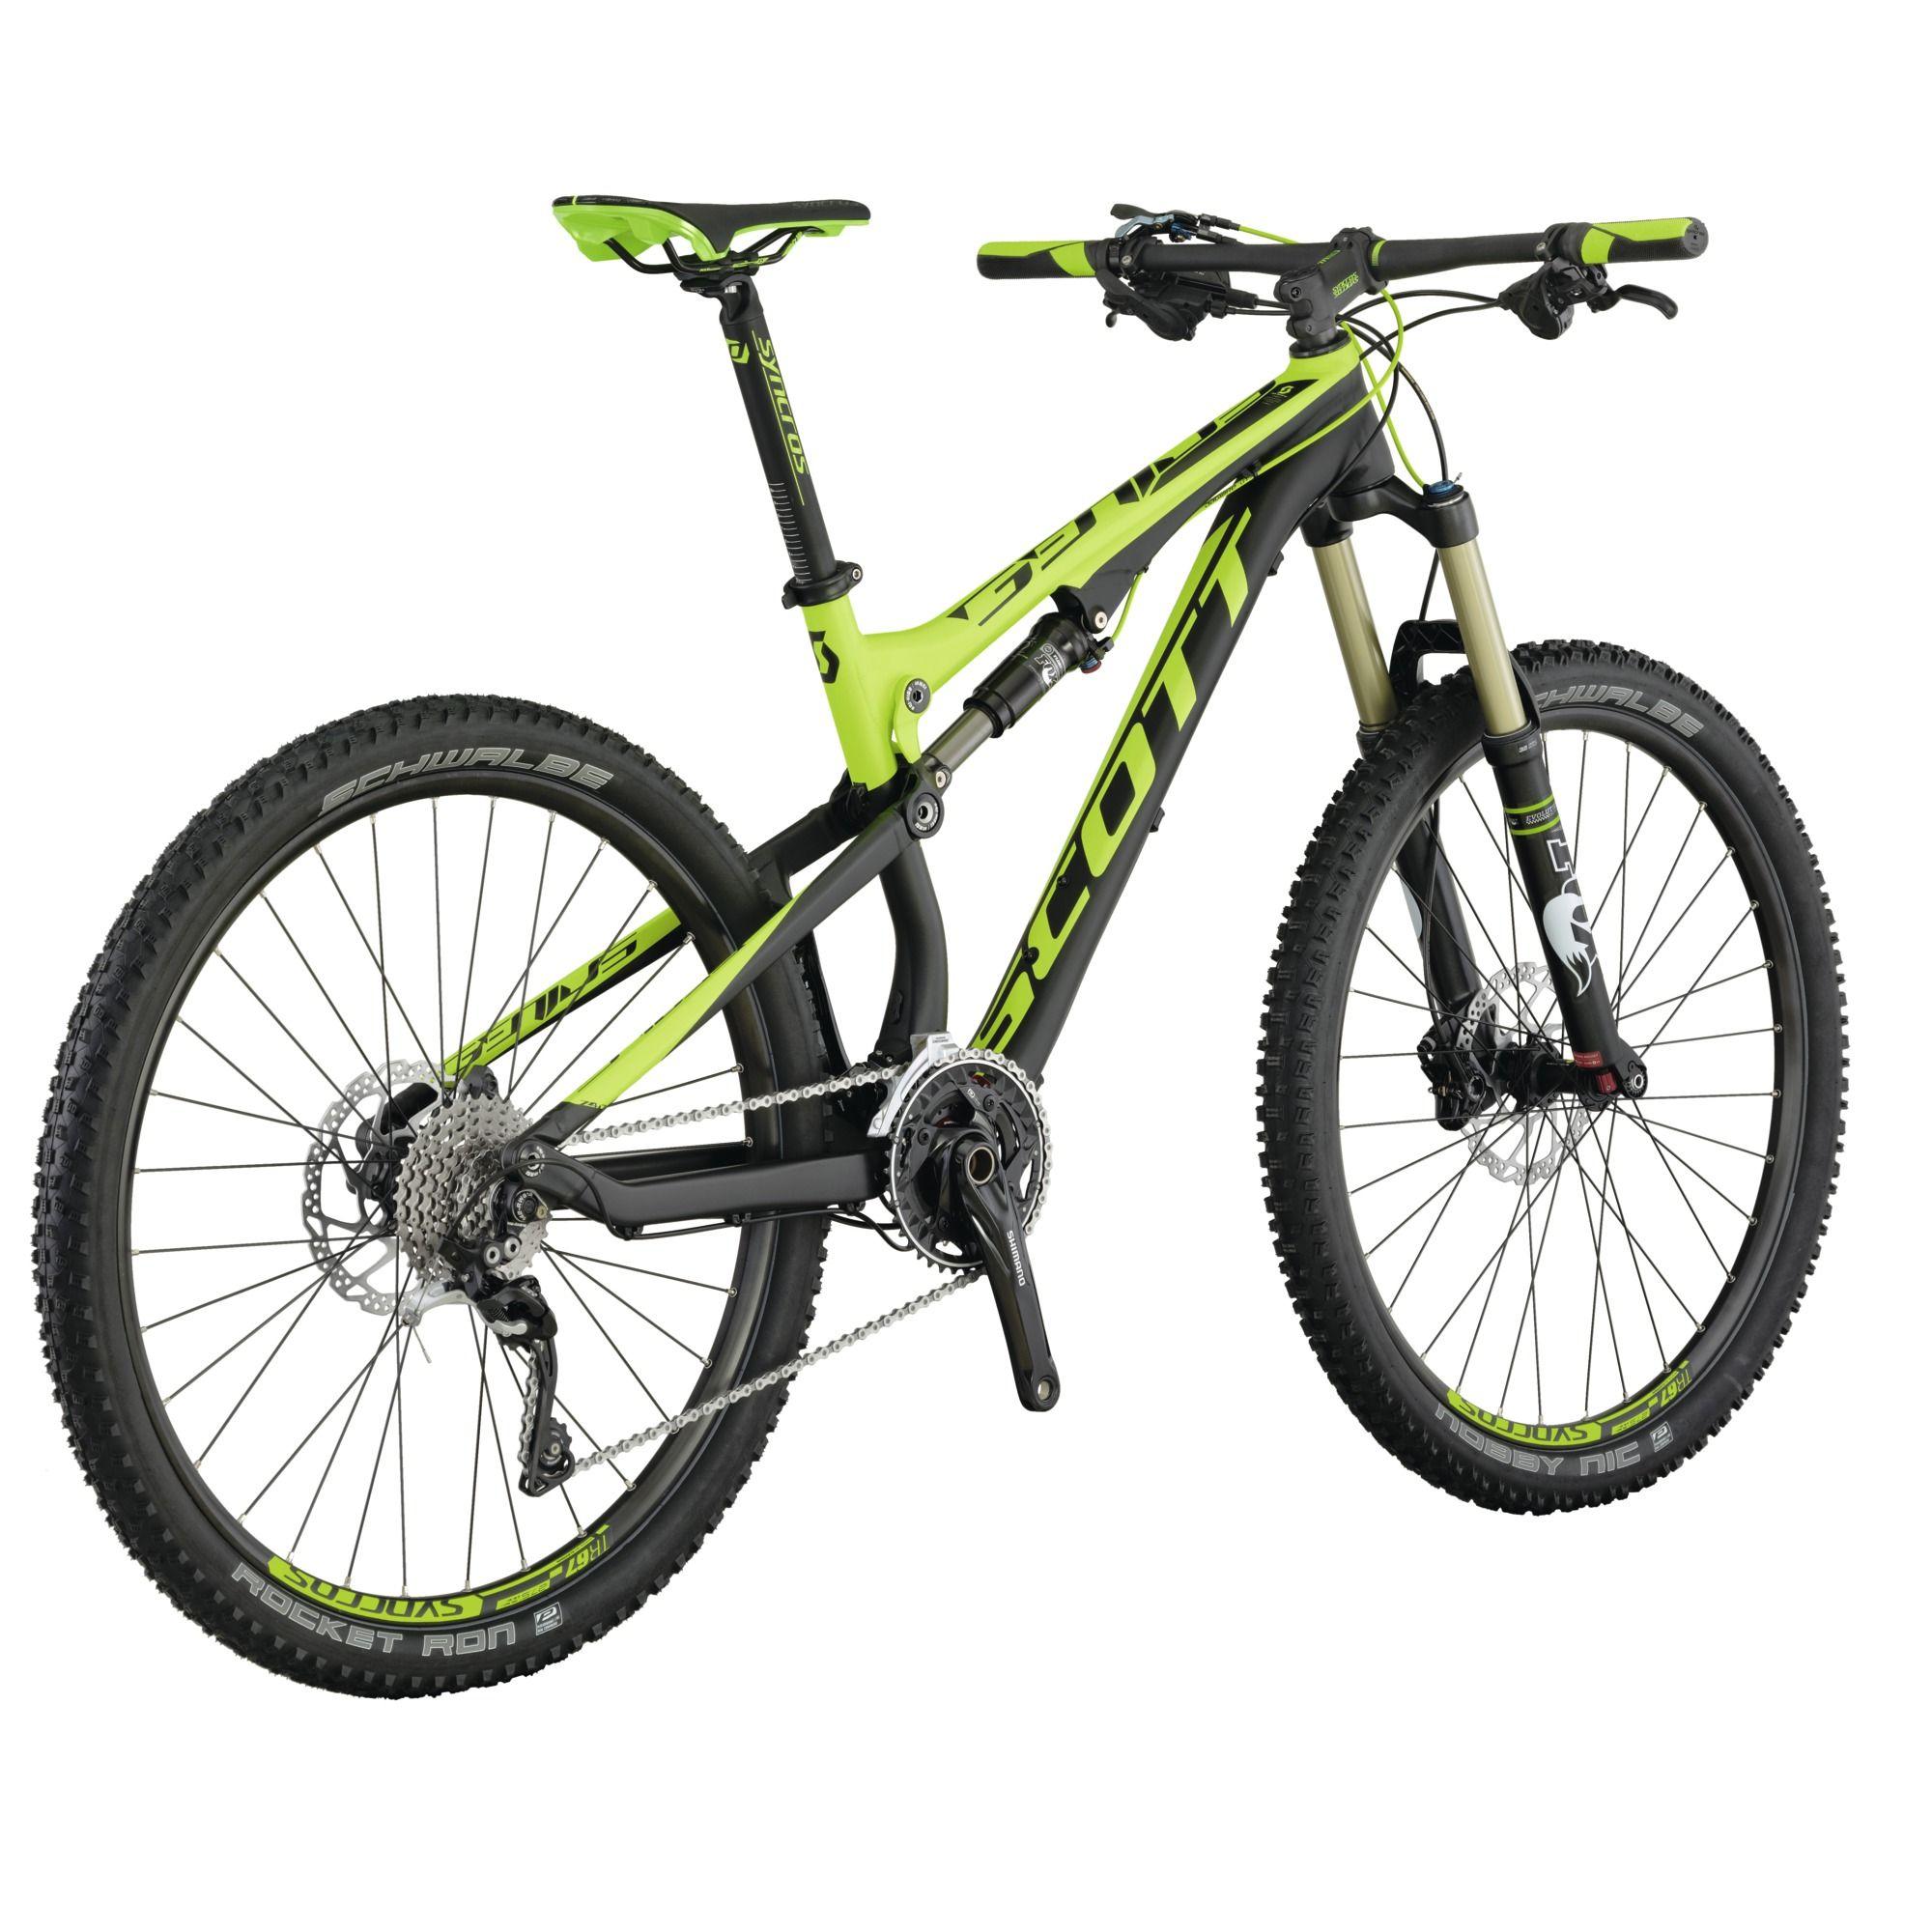 Scott Sports Scott Genius 740 Bike Ciclismo Bicicletas Esportes